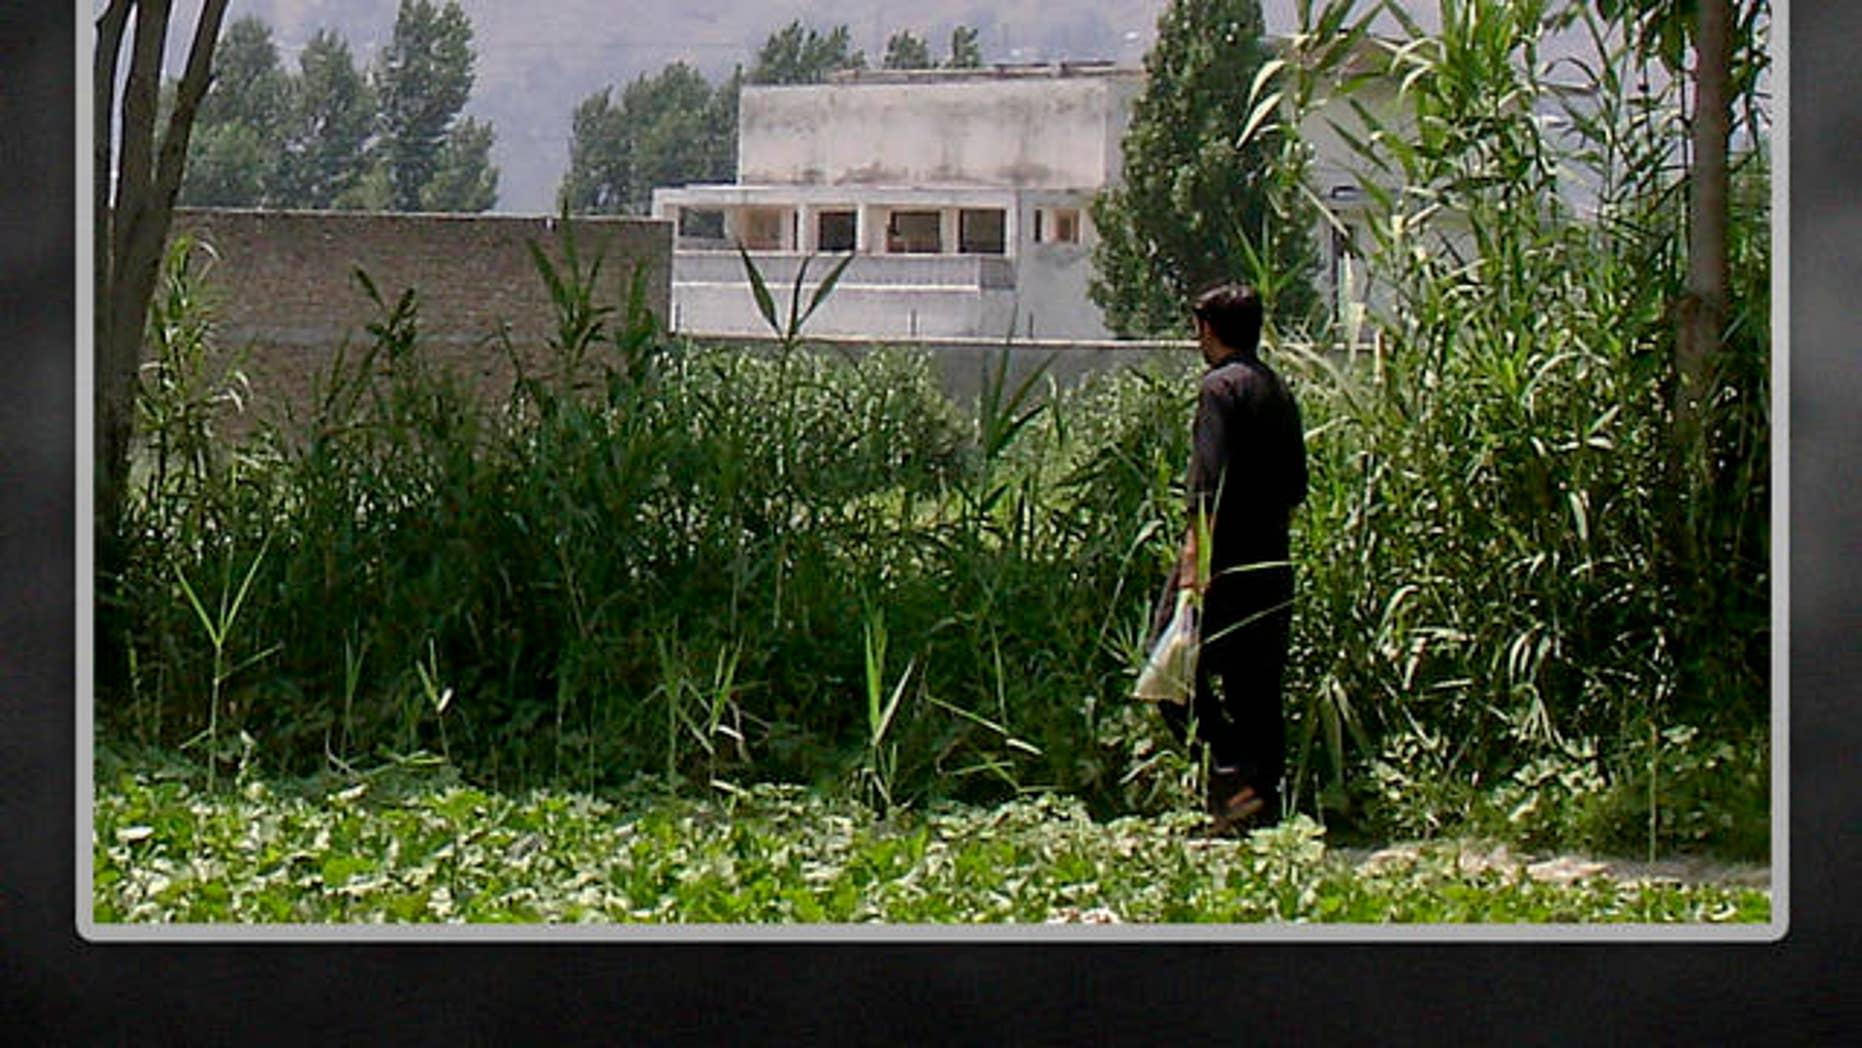 FILE: A local residents walks near a house where Al Qaeda leader Usama bin Laden was killed, Abbottabad, Pakistan.